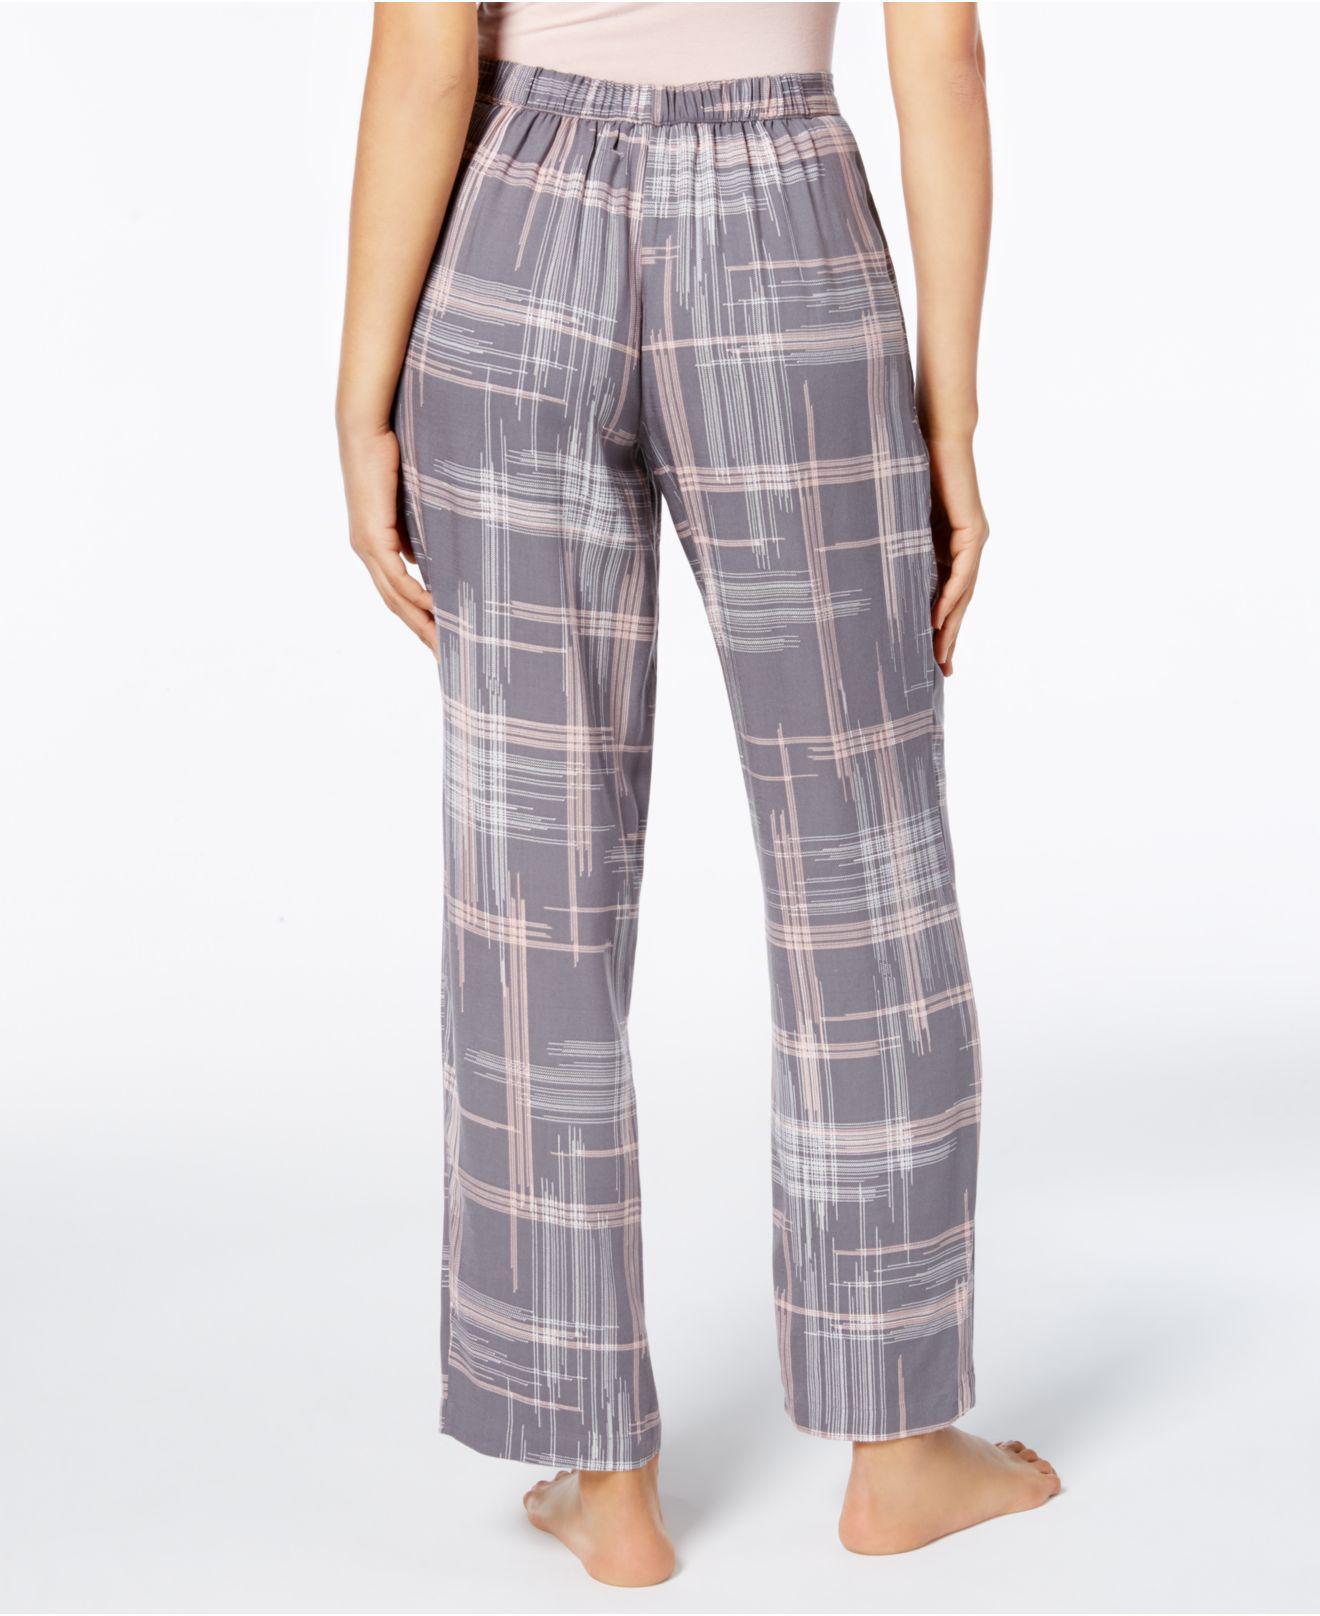 608a57ed76e3 Lyst - Alfani Printed Pajama Pants in Gray